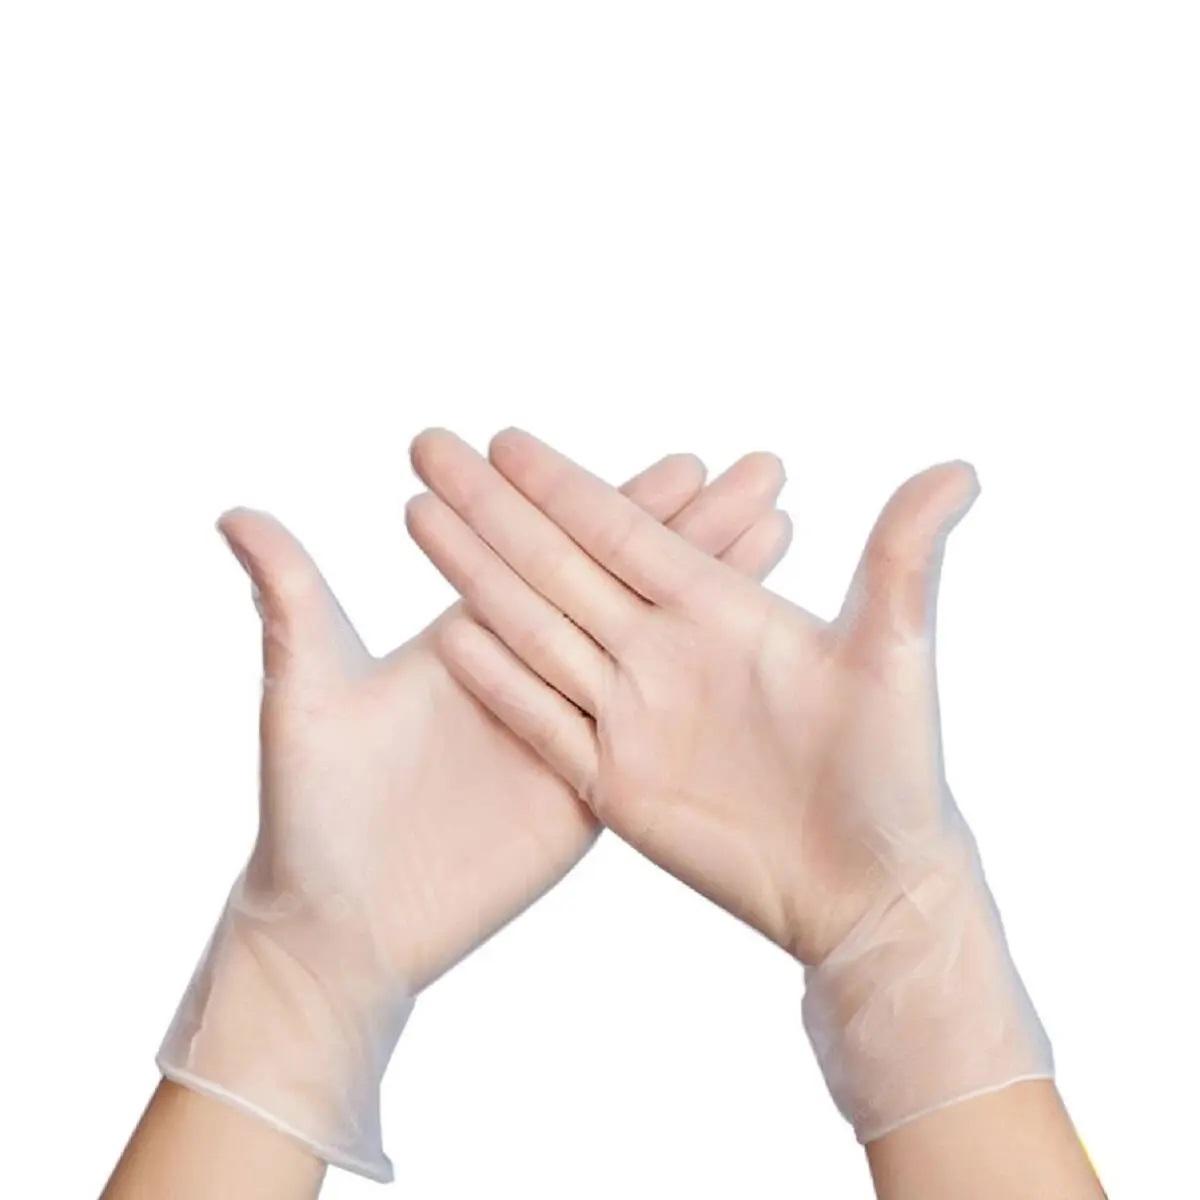 100pcs Γάντια προστασίας από ιόν μολύβδου μίας χρήσεως INTCO Εξαιρετικά μαλακό χωρίς λατέξ Χωρίς DOP επίπεδο επιπέδου τροφίμων για μαγείρεμα Εργασίες οικιακής χρήσης ζωγραφικής Μέγεθος S - Διαφανές